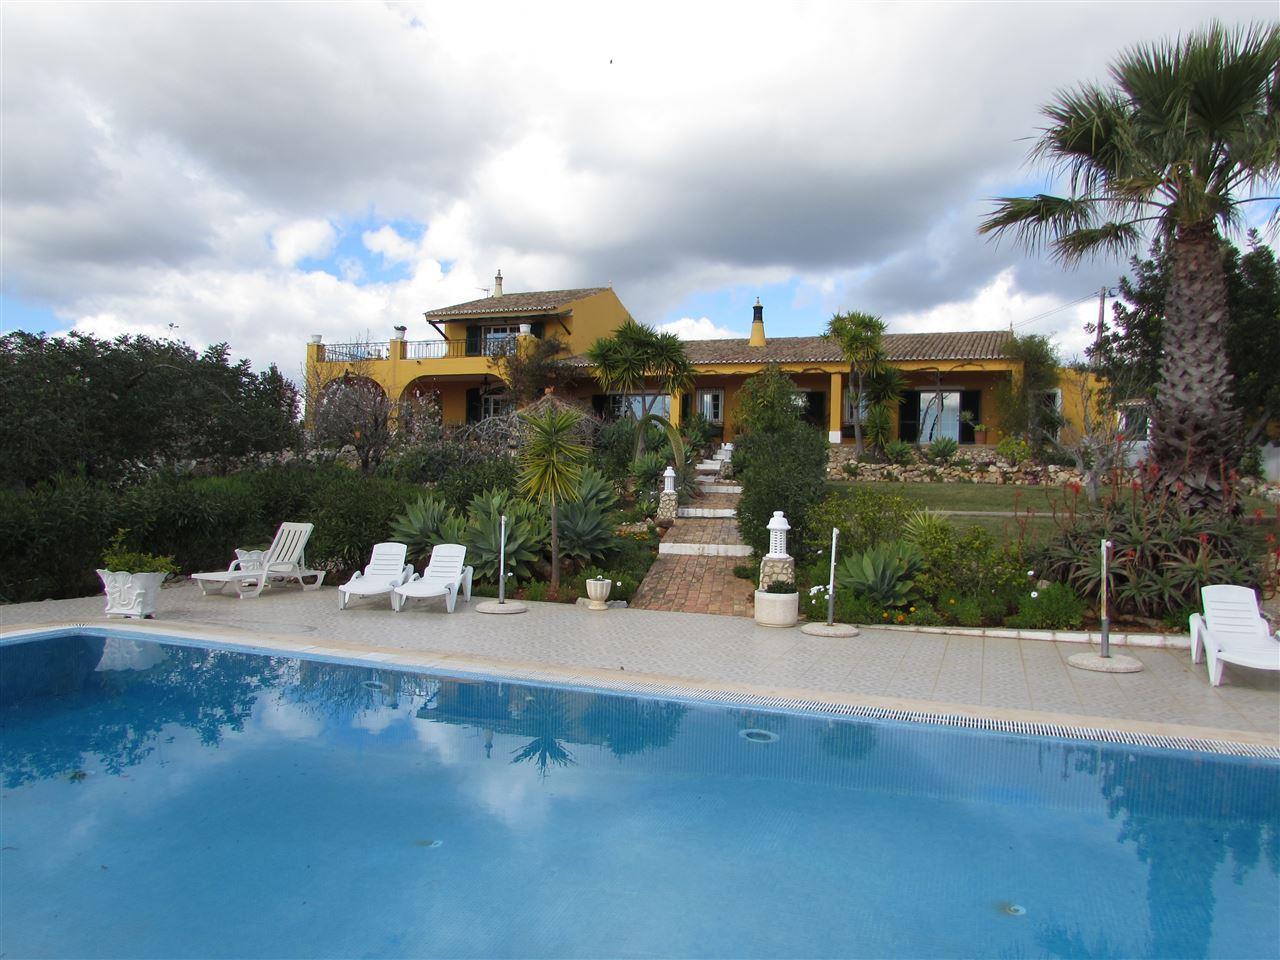 Tek Ailelik Ev için Satış at Country house, 4 bedrooms, for Sale Silves, Algarve Portekiz